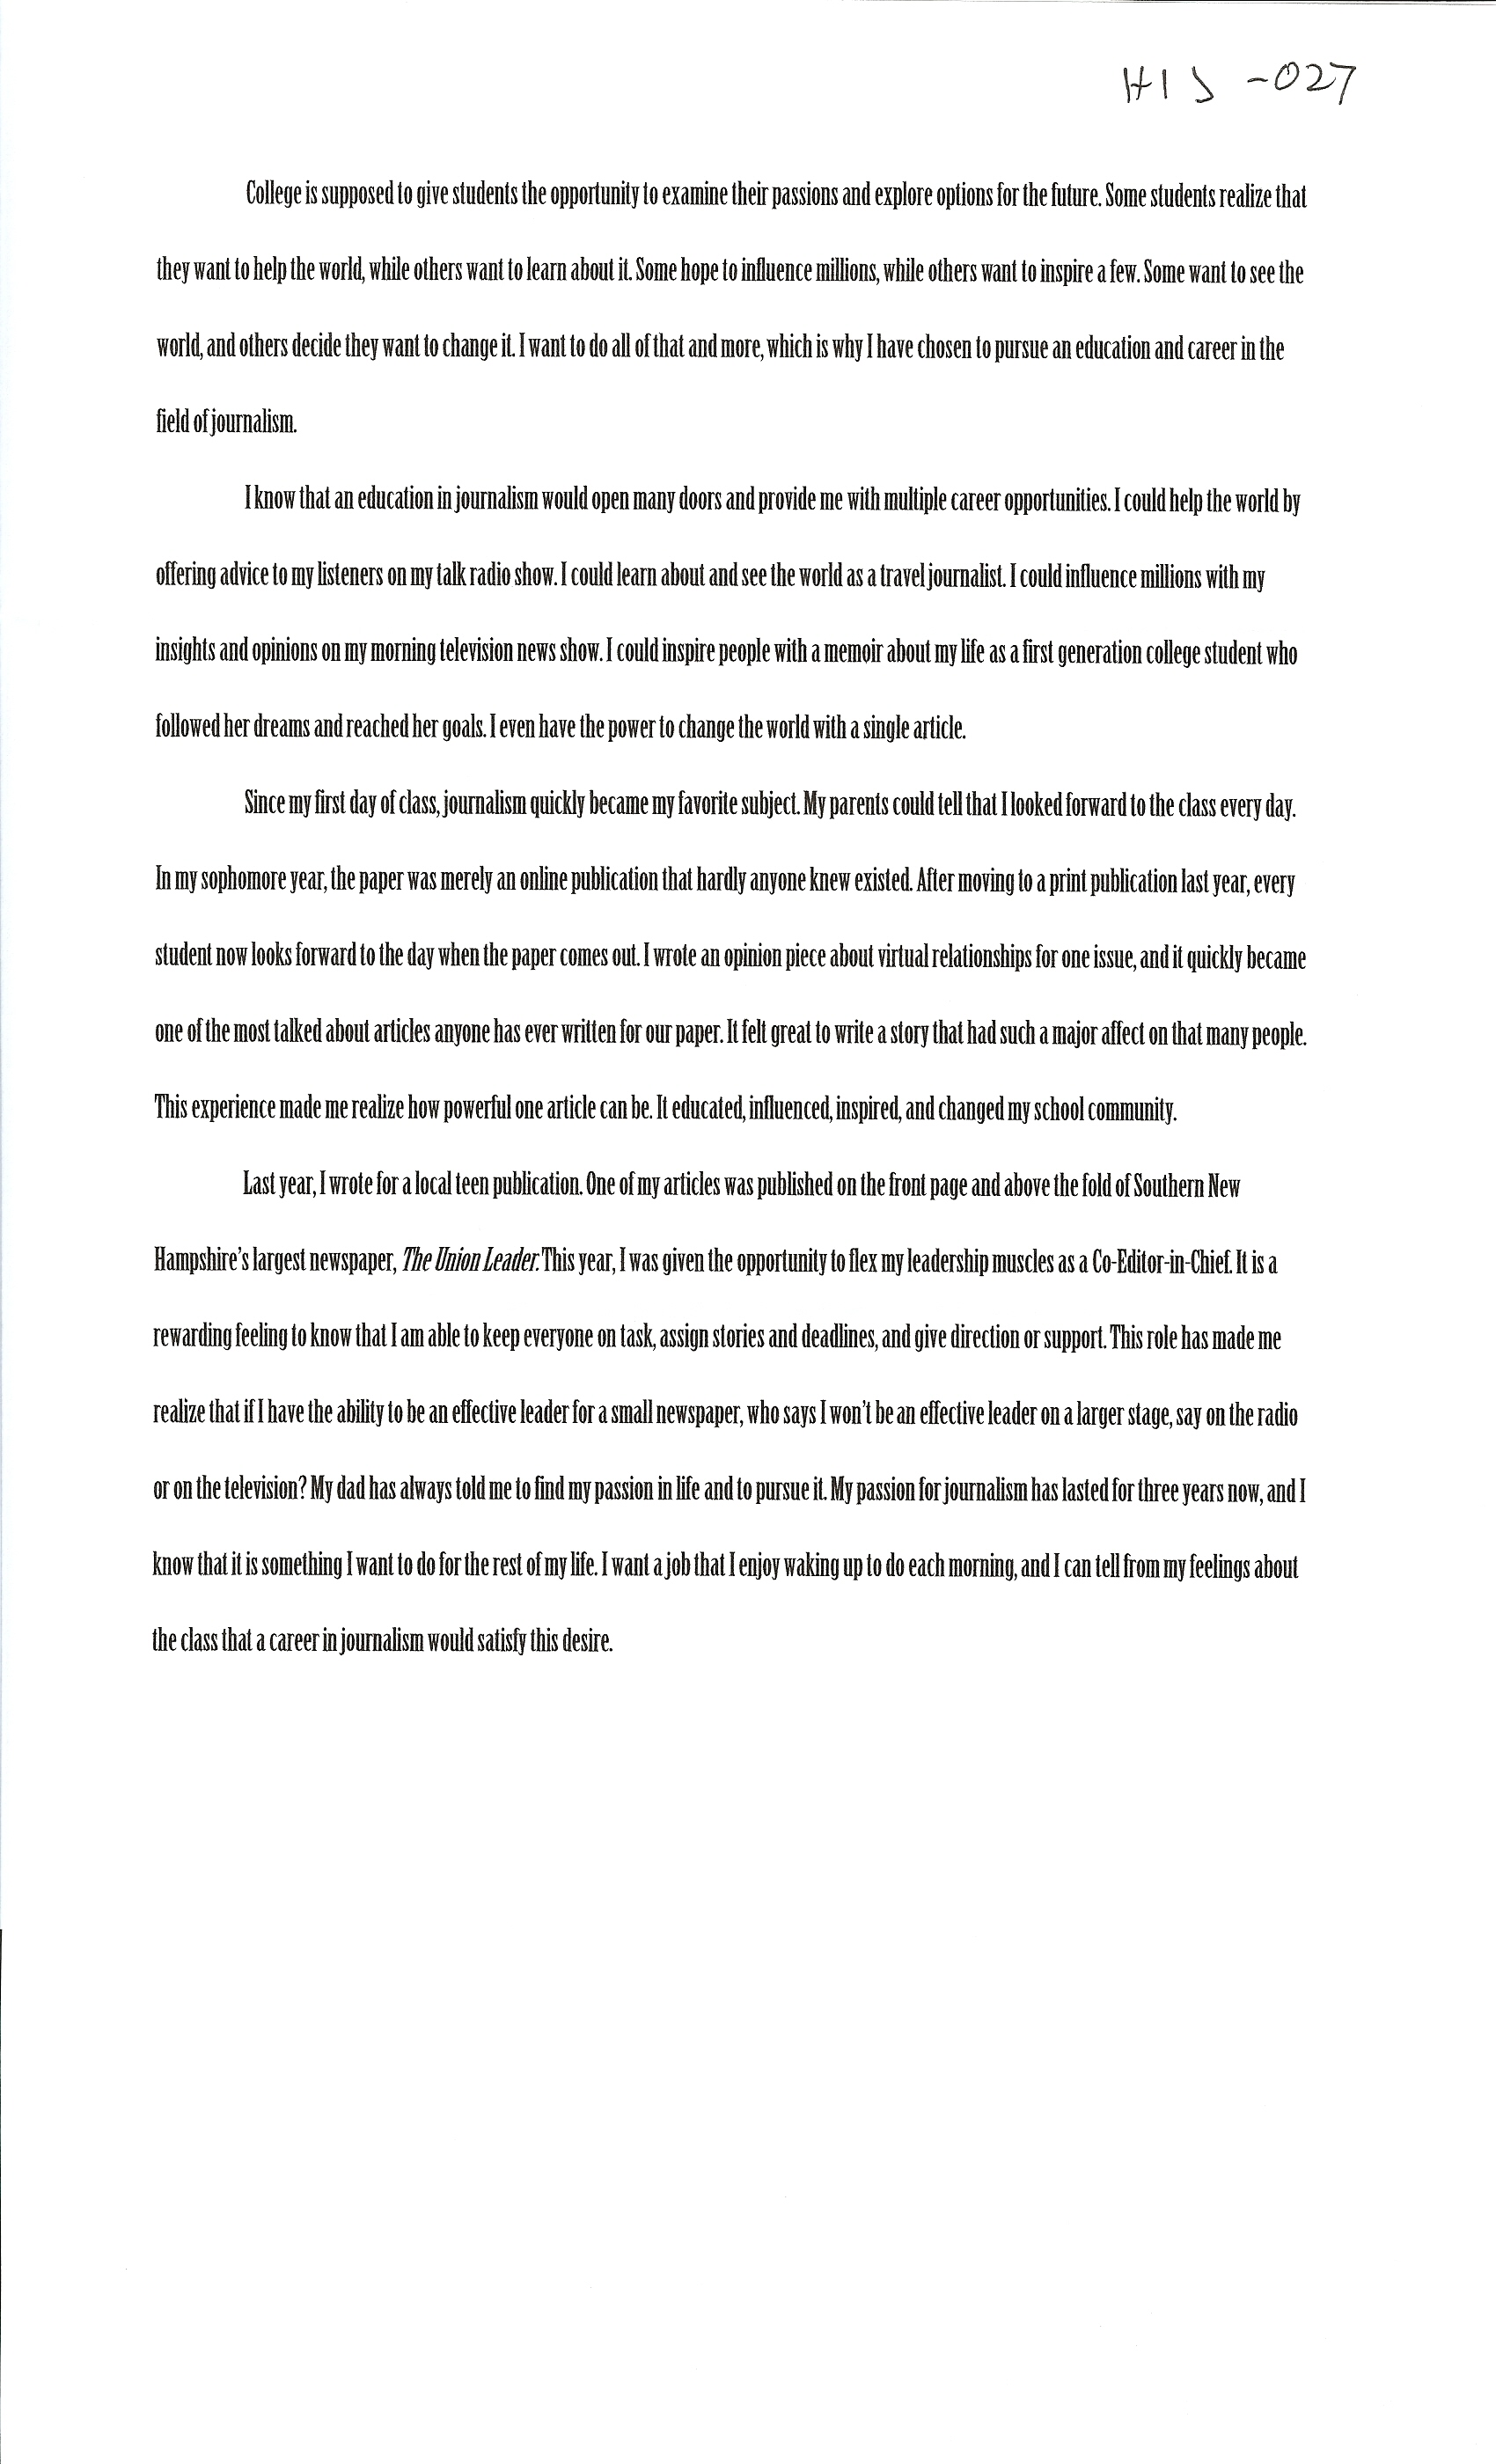 005 Alexa Serrecchia Essay Leaderships Unique Leadership Examples Application Sample Personal Philosophy Uc Full